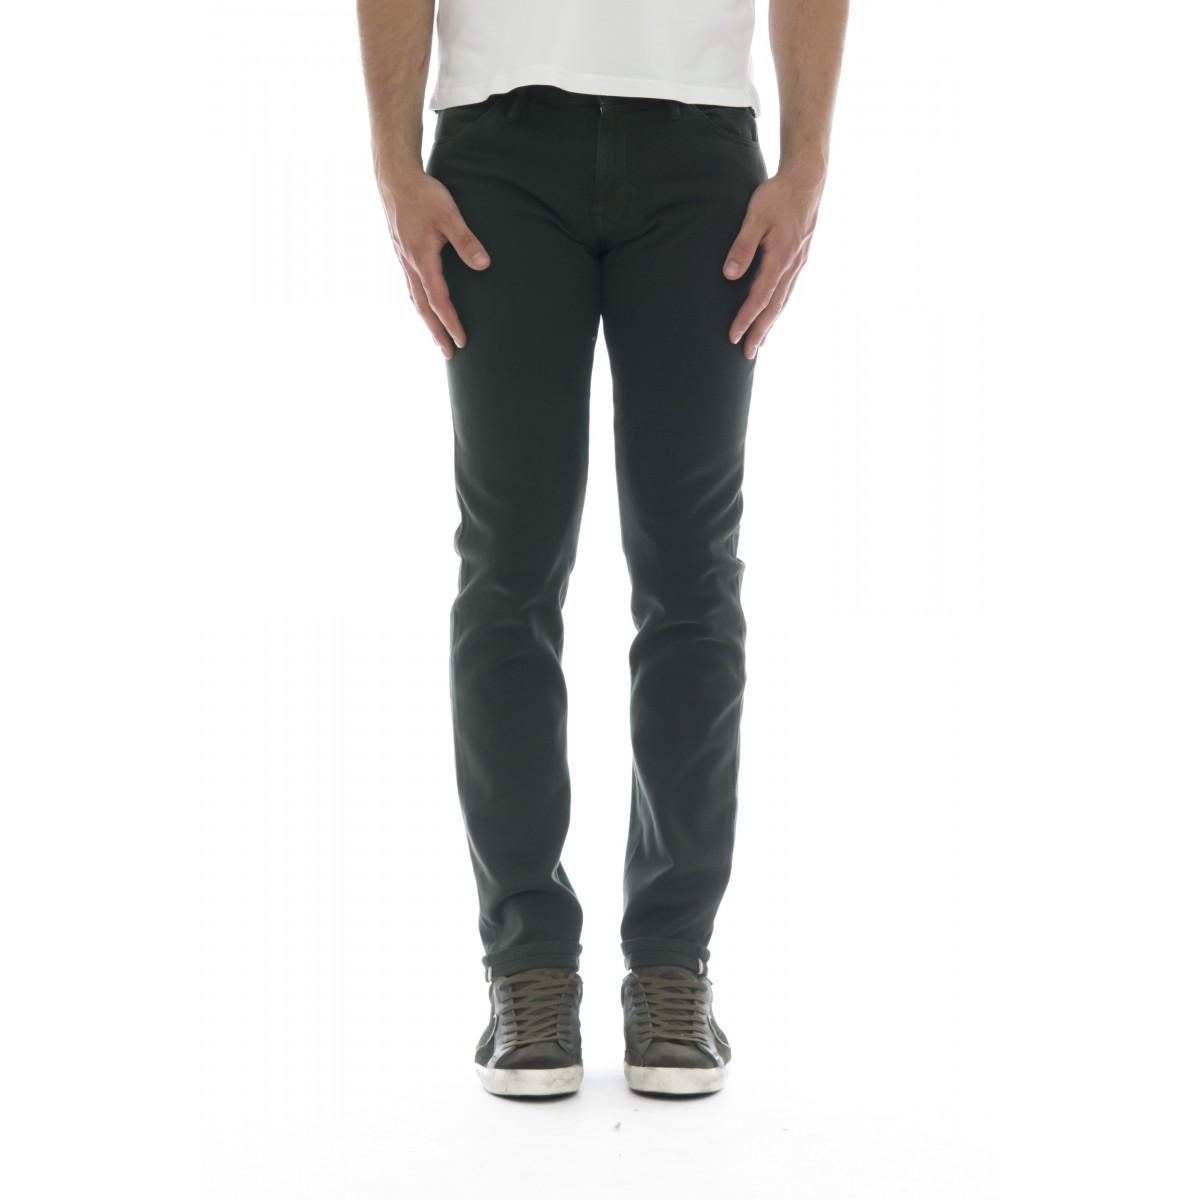 Pantalone uomo - Swing sd11 super slim 5 tasche supersoft strech drill